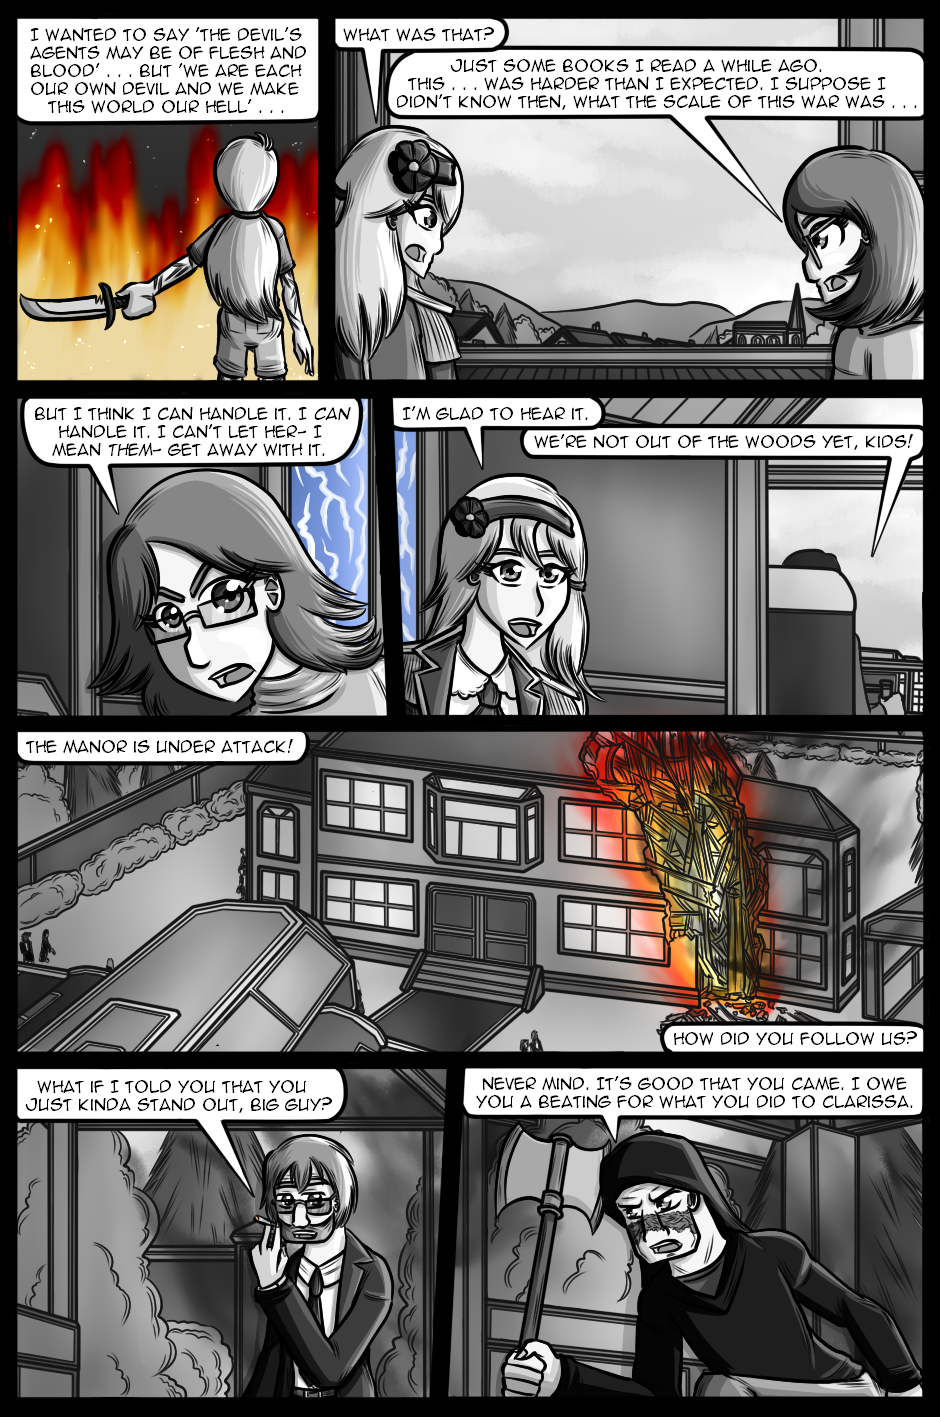 Fire Suppression, Part 46